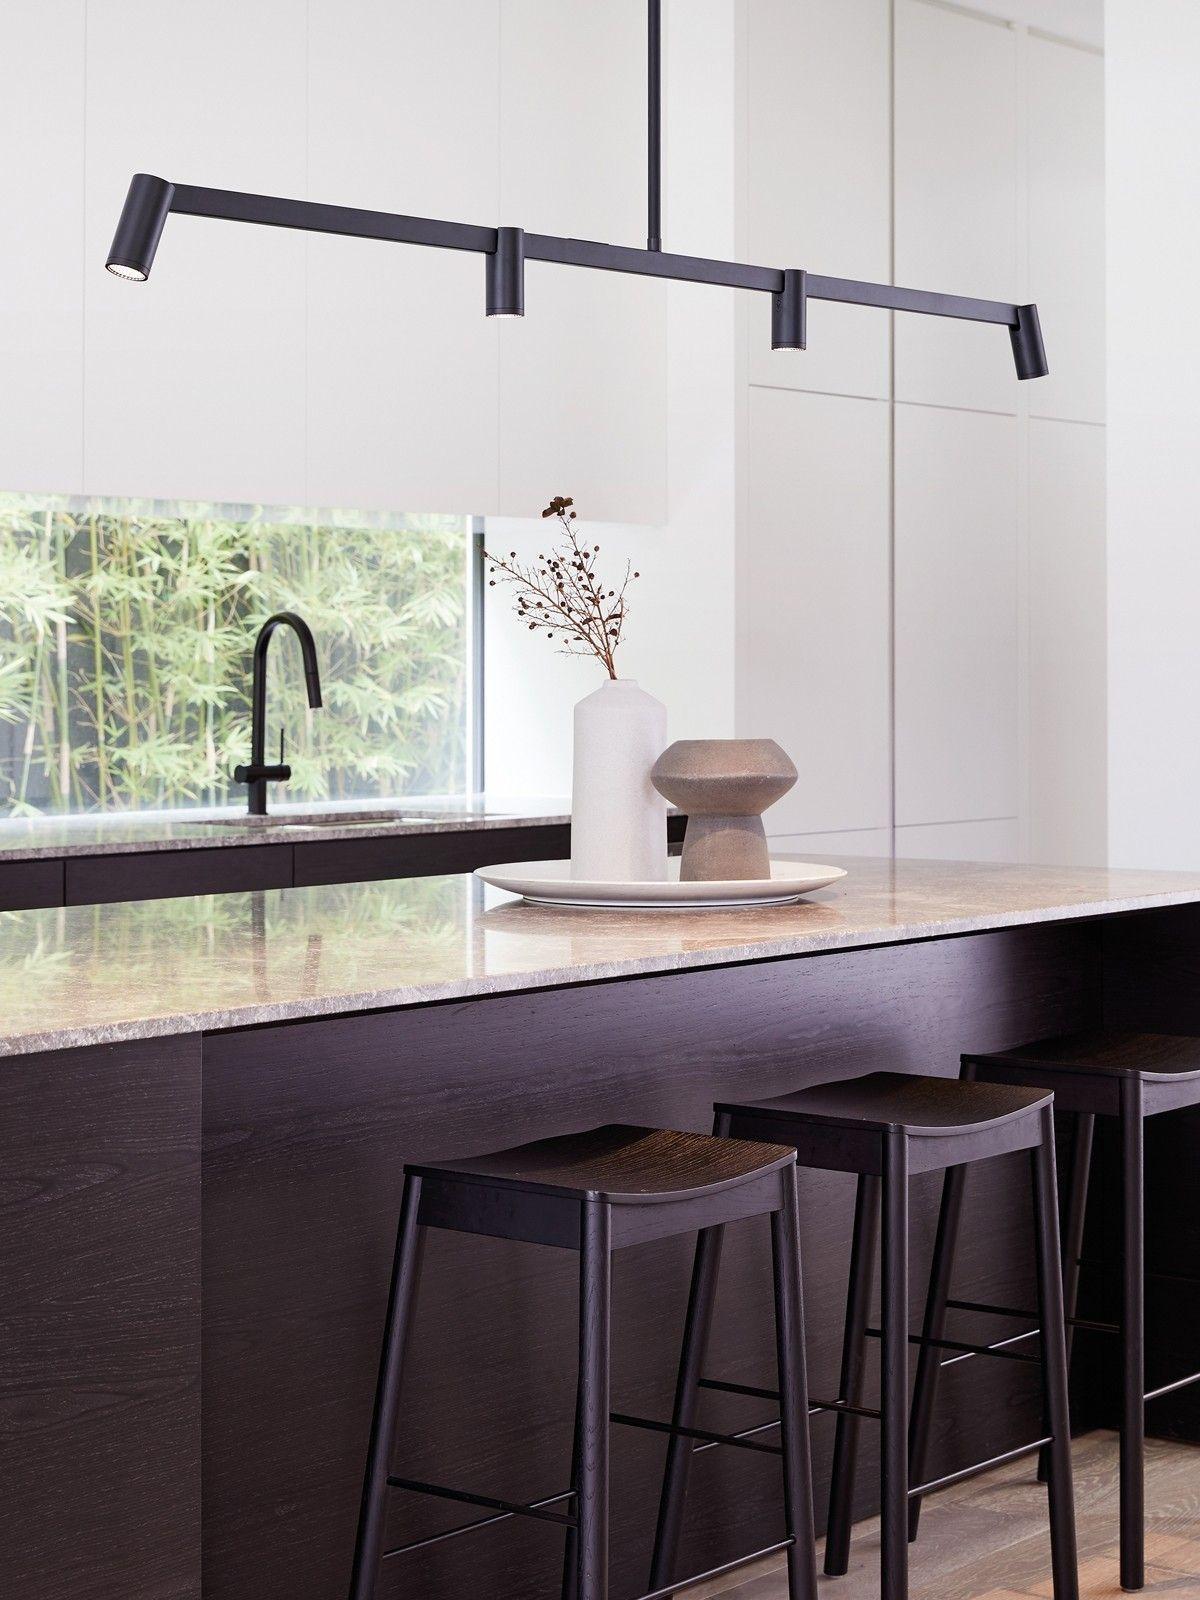 15 Best Kitchen Island Lighting Ideas To Inspire You Black Kitchen Island Kitchen Island Bench Kitchen Feature Lighting